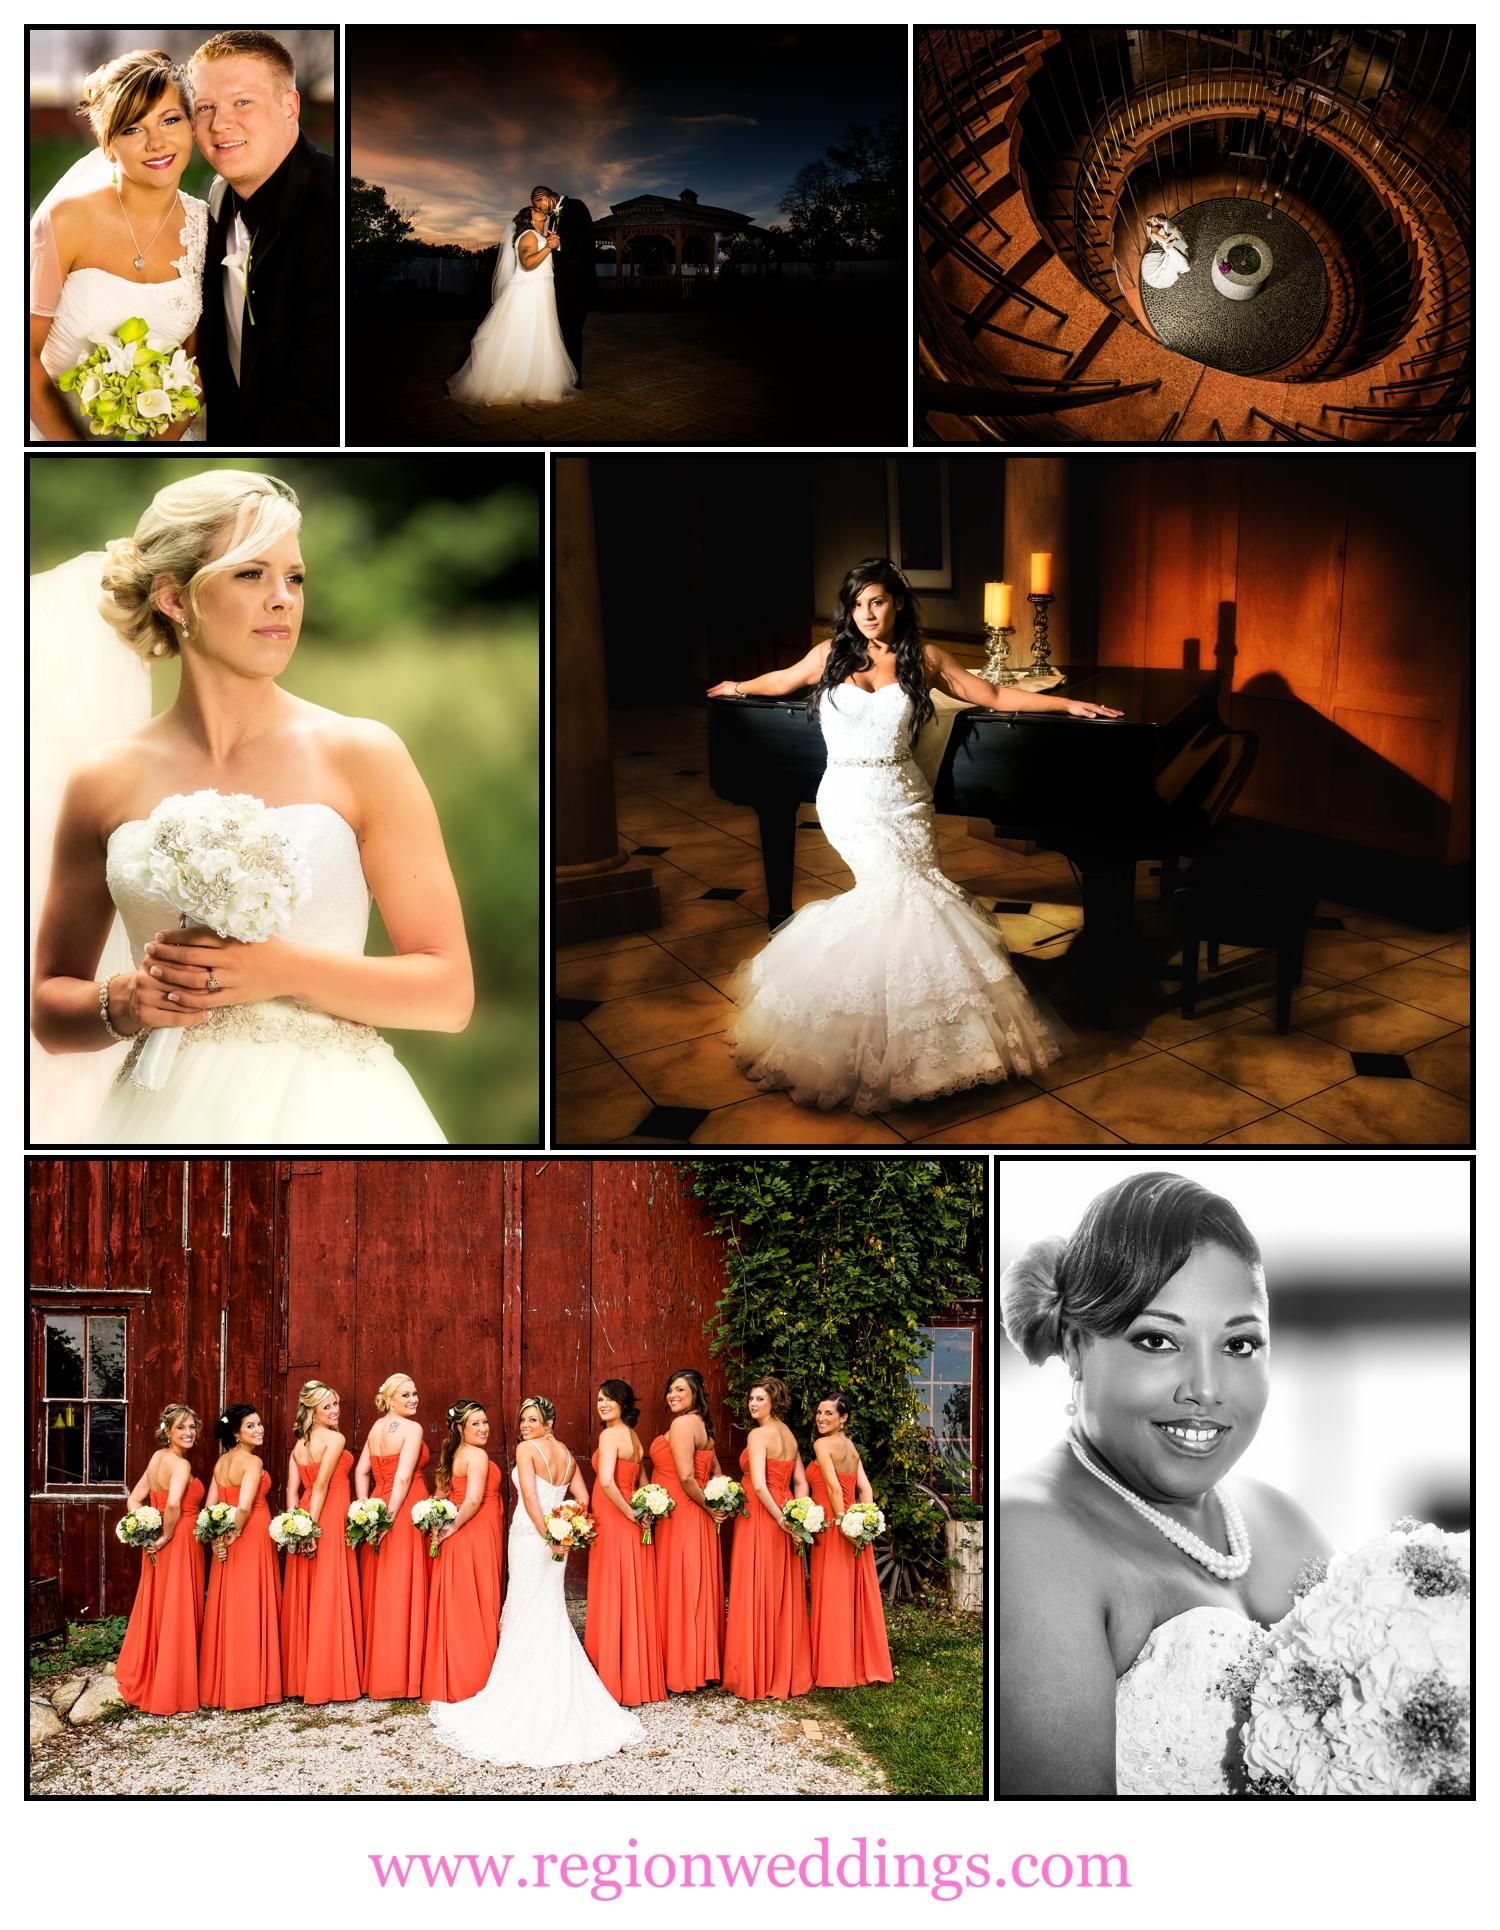 A collection of images from Northwest Indiana wedding photographer Steve Vansak of Region Weddings.